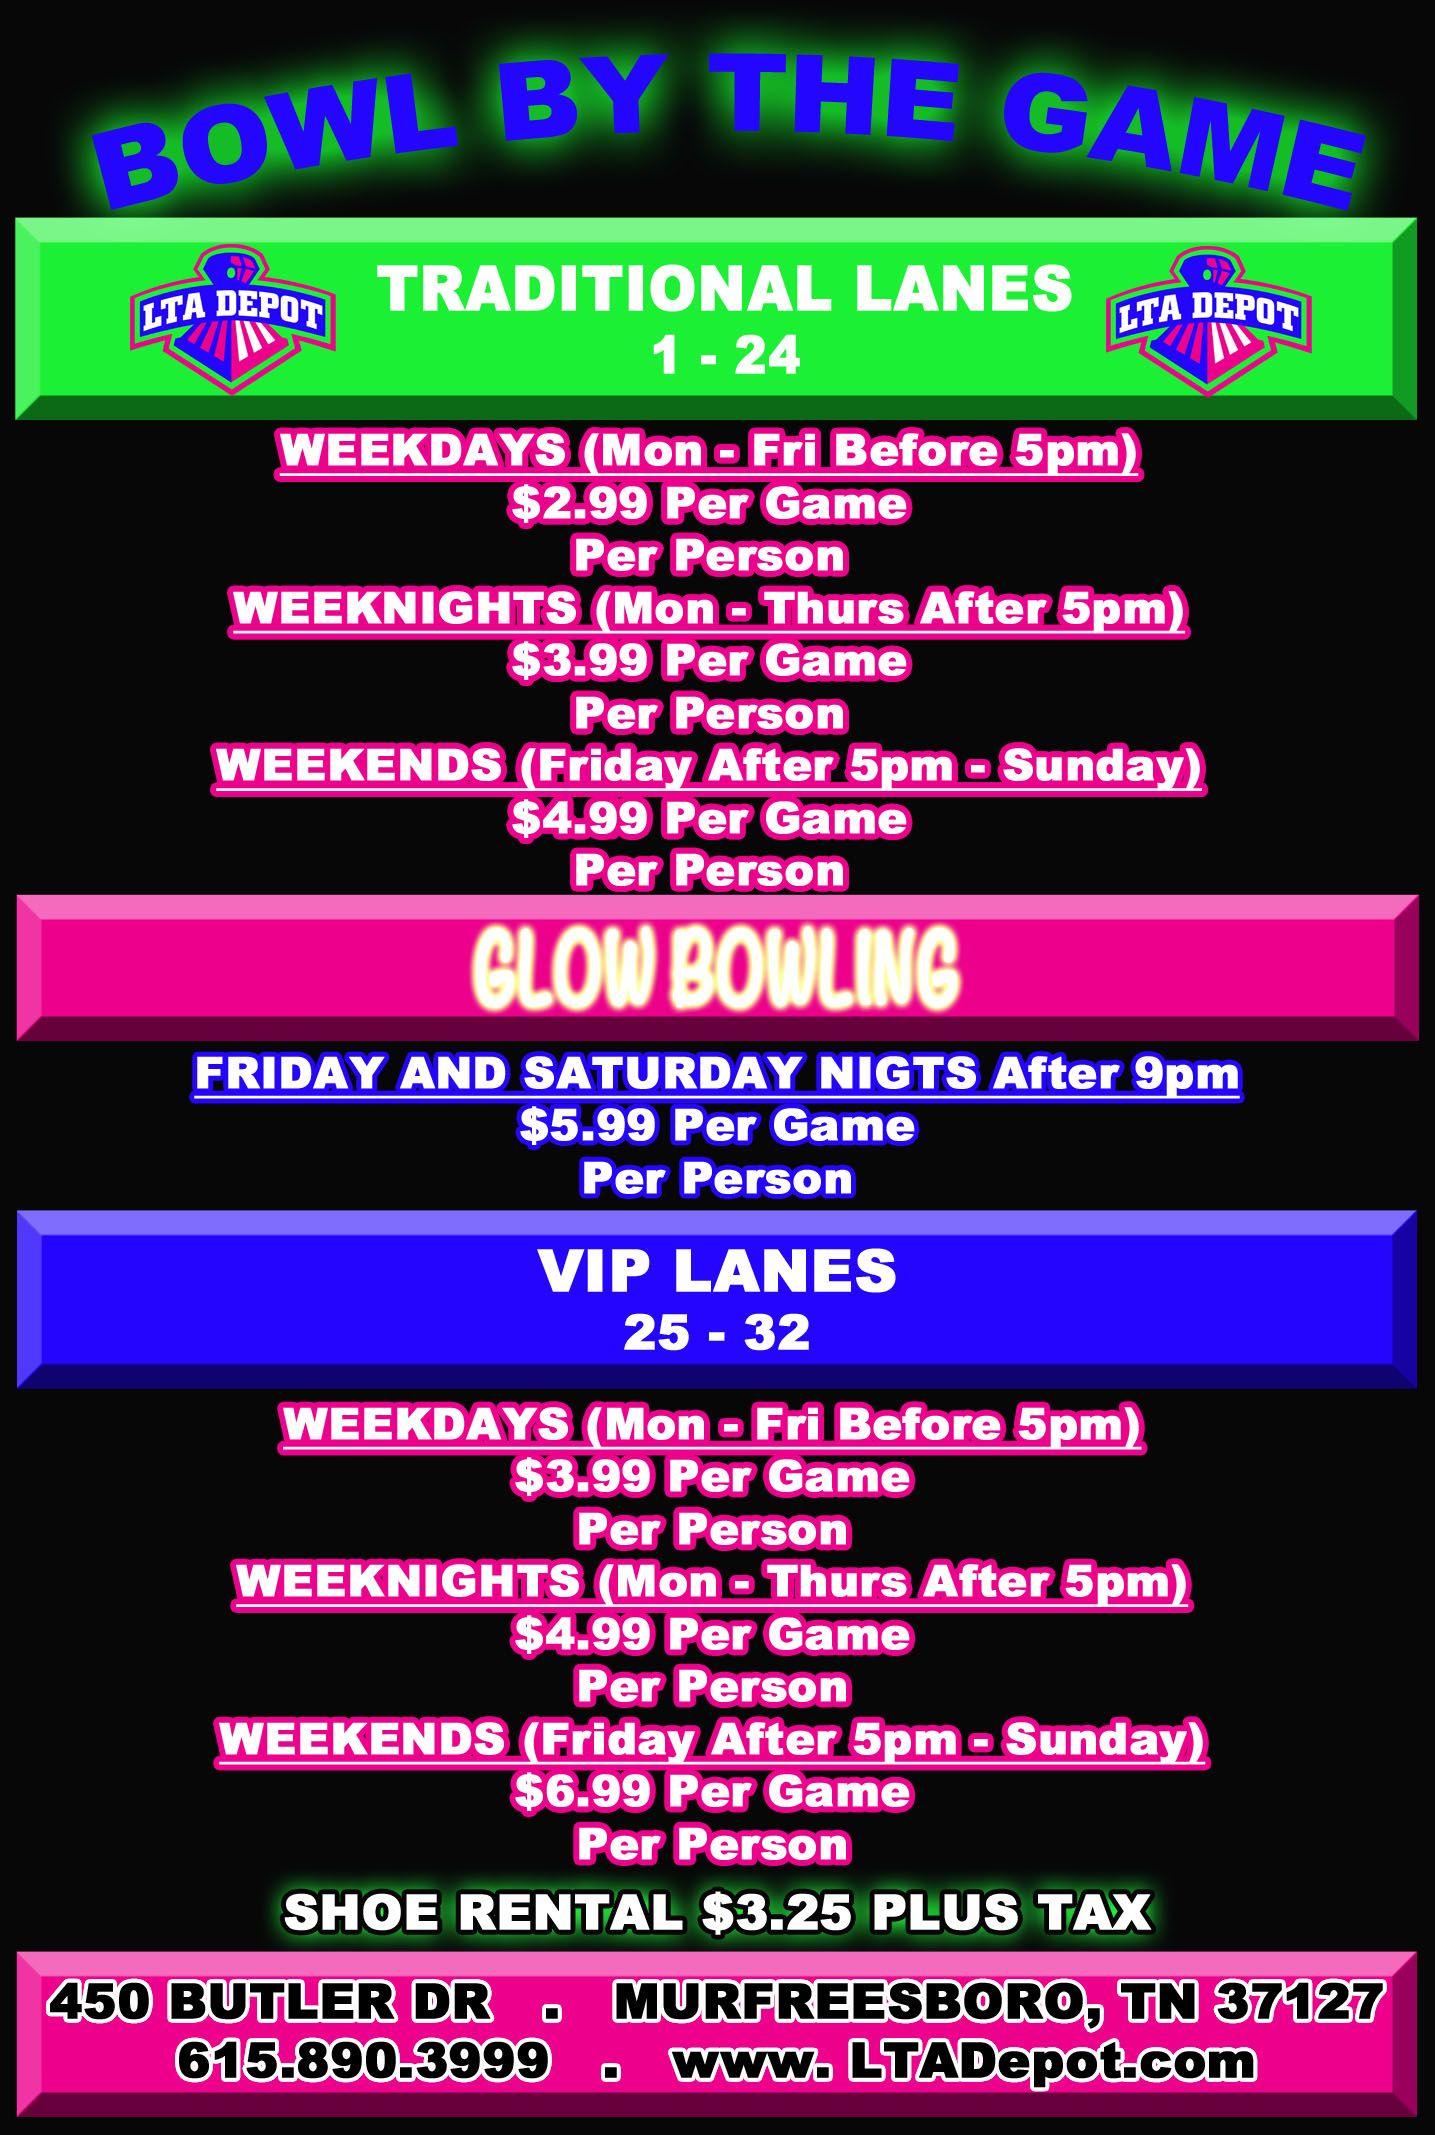 Lanes Trains Automobiles Entertainment Depot Information Bowling Rates Bowling Glow Bowling Bowl Game